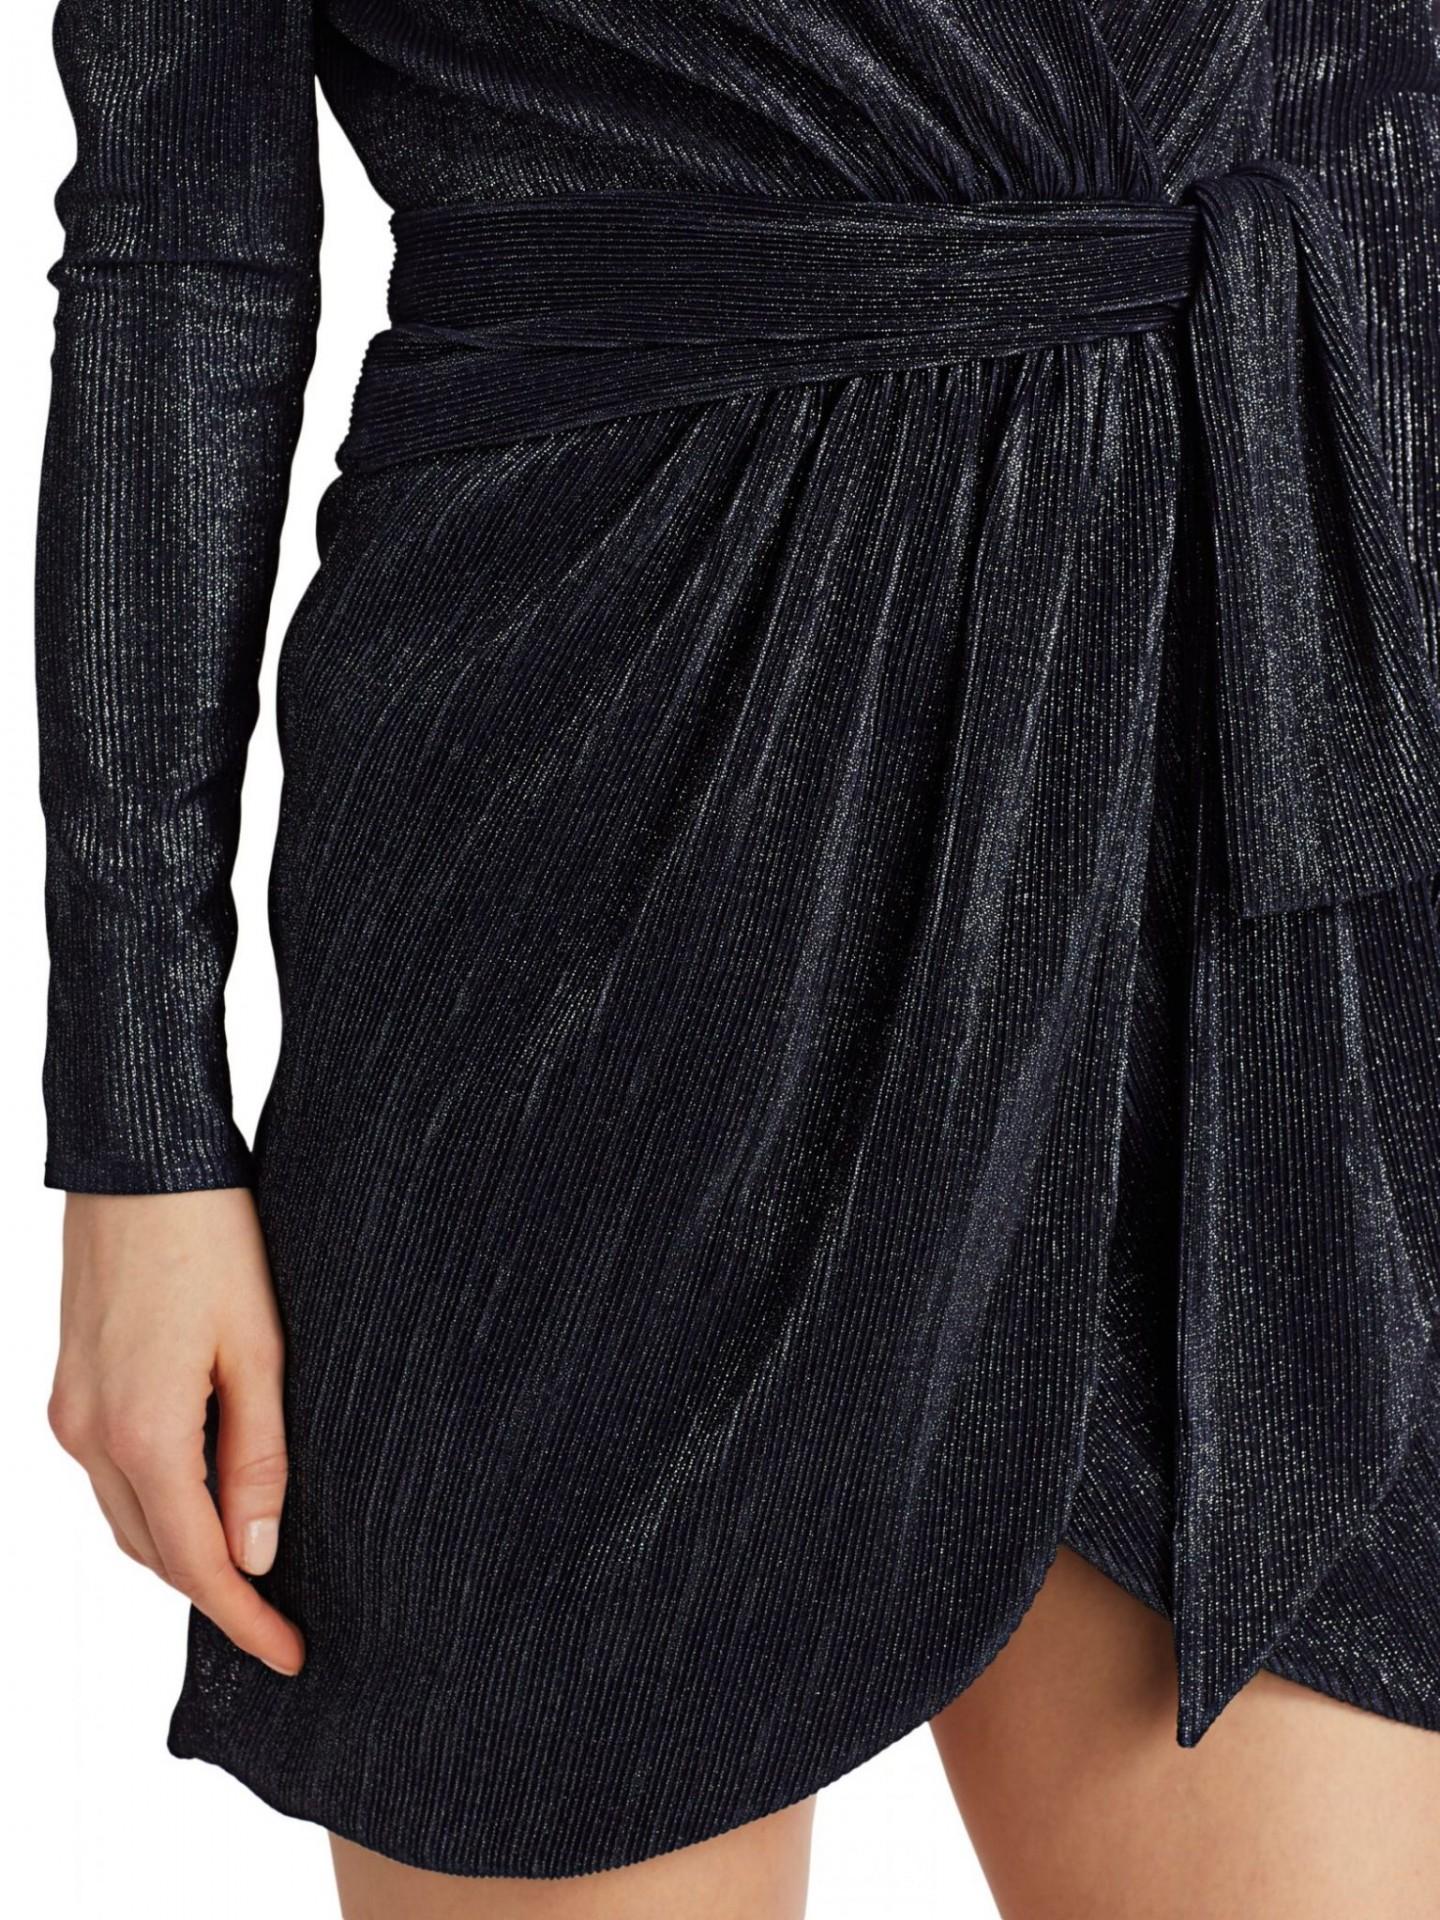 JONATHAN SIMKHAI Metallic Puff-Sleeve Wrap Dress